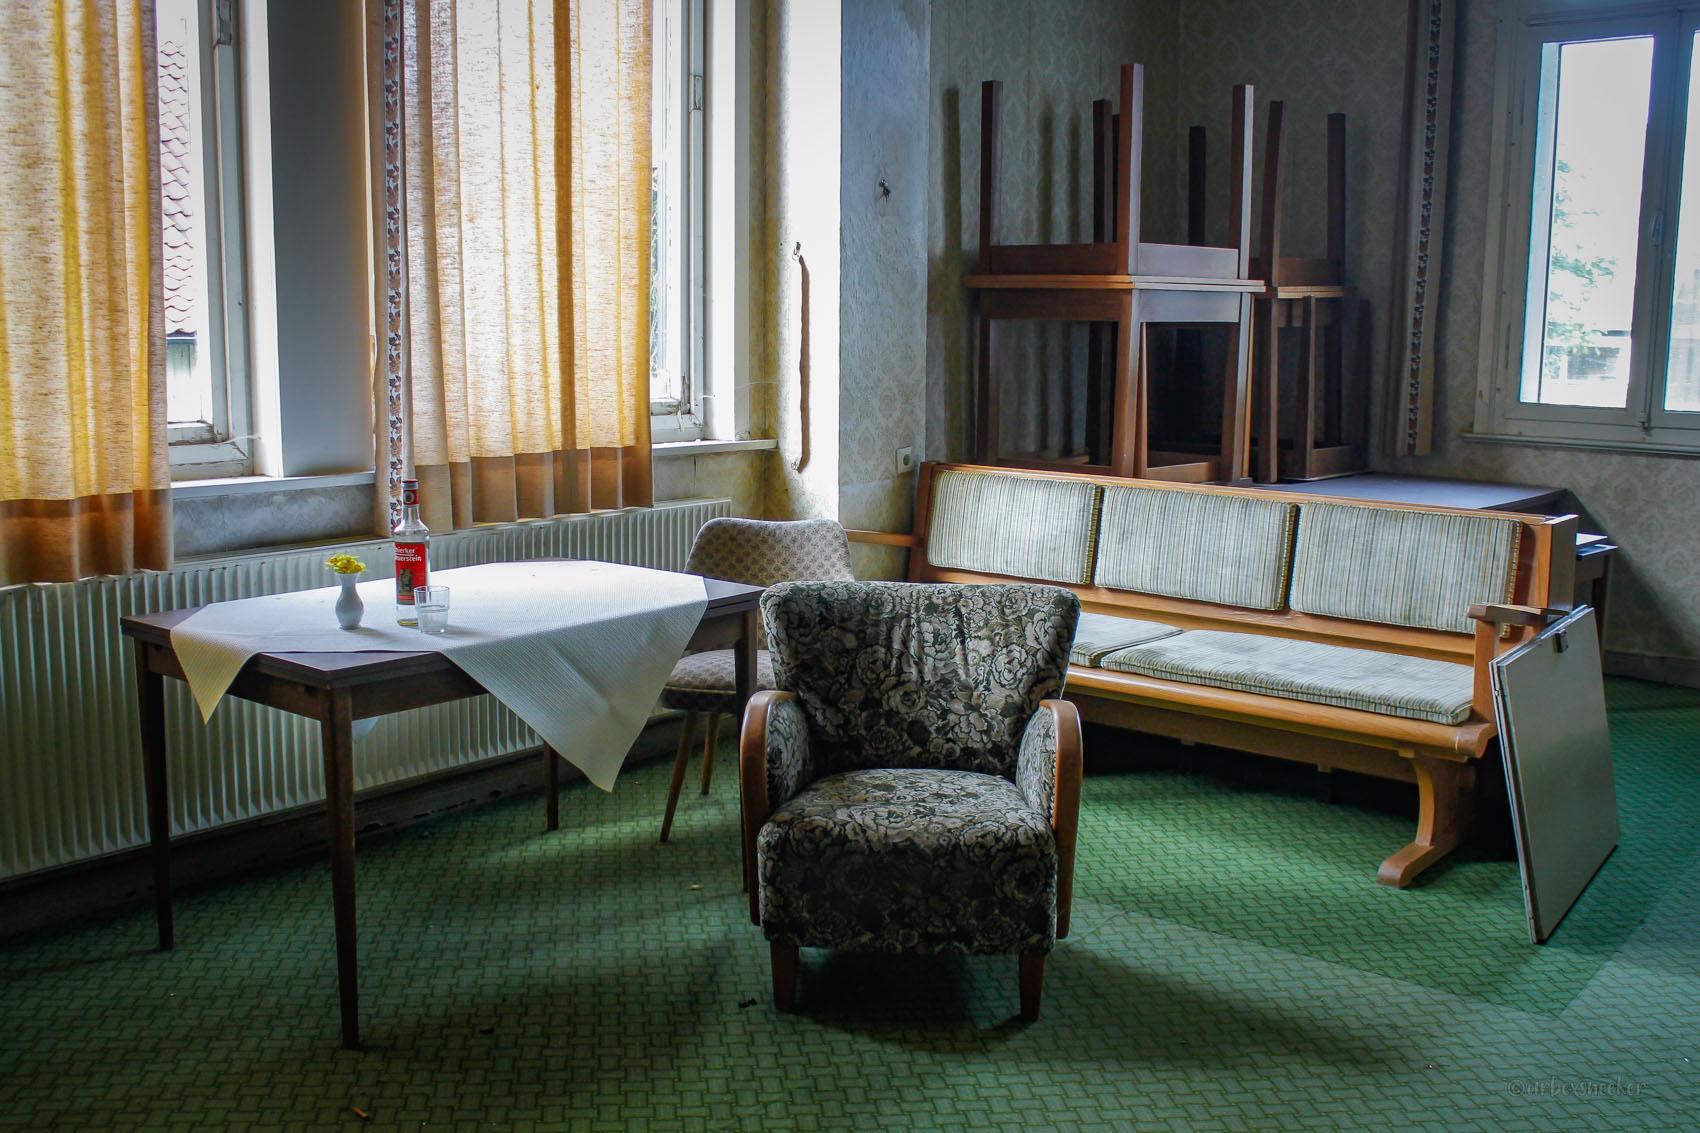 Hotel Teddy Sitzbank